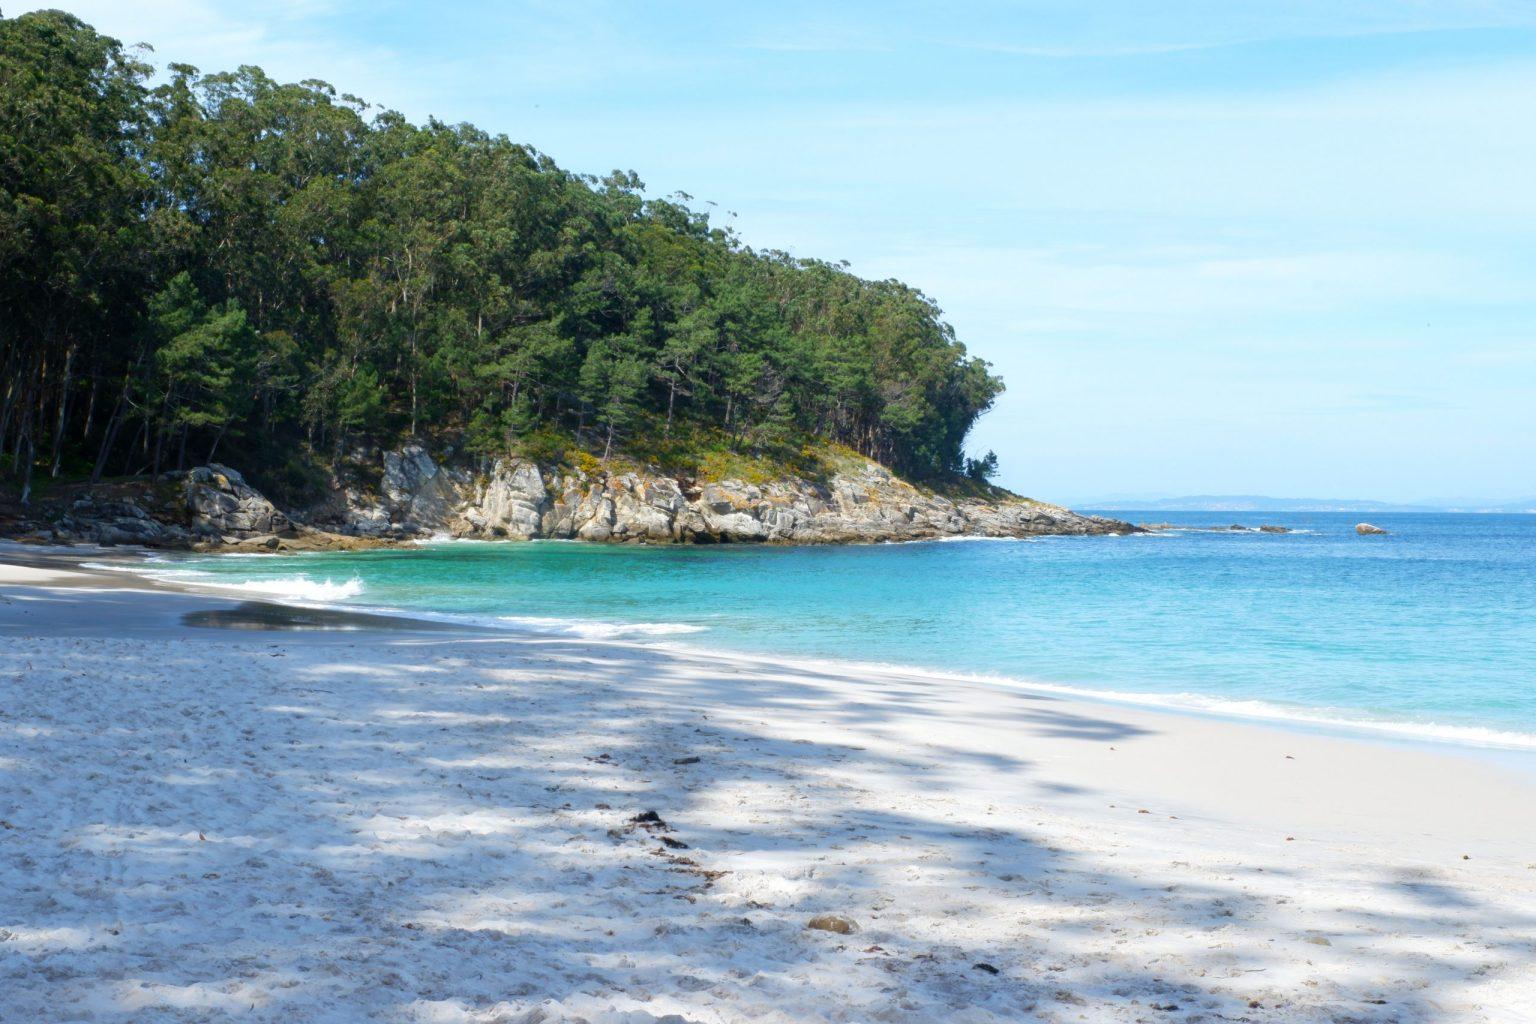 Les îles Cies en Galice